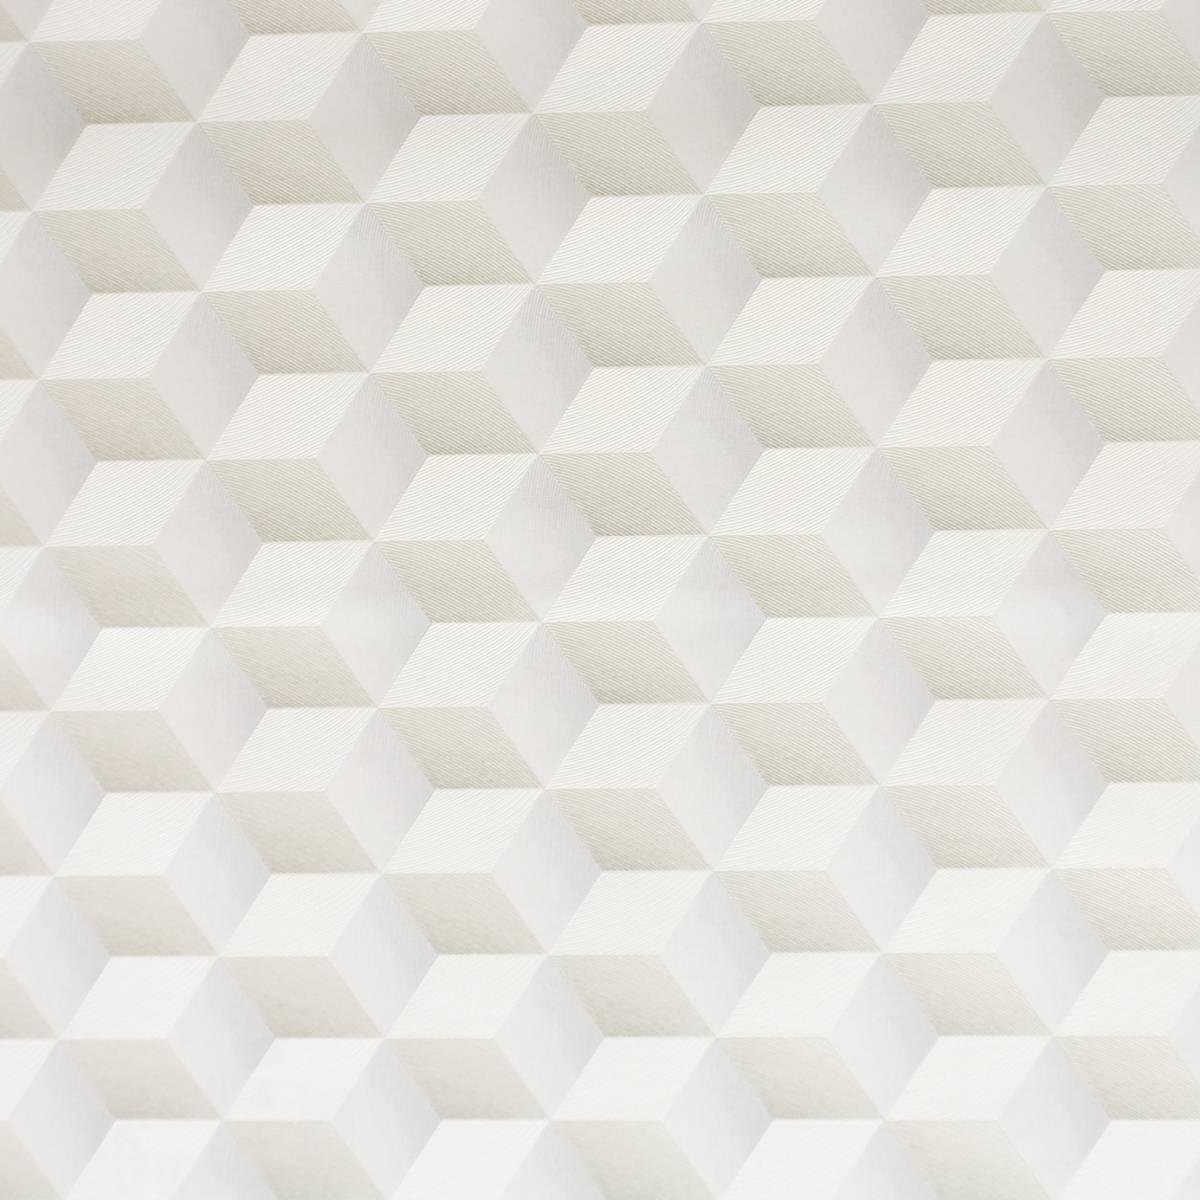 Square 3d wallpaper gold white 28352022 casadeco for 3d wallpaper for home uk